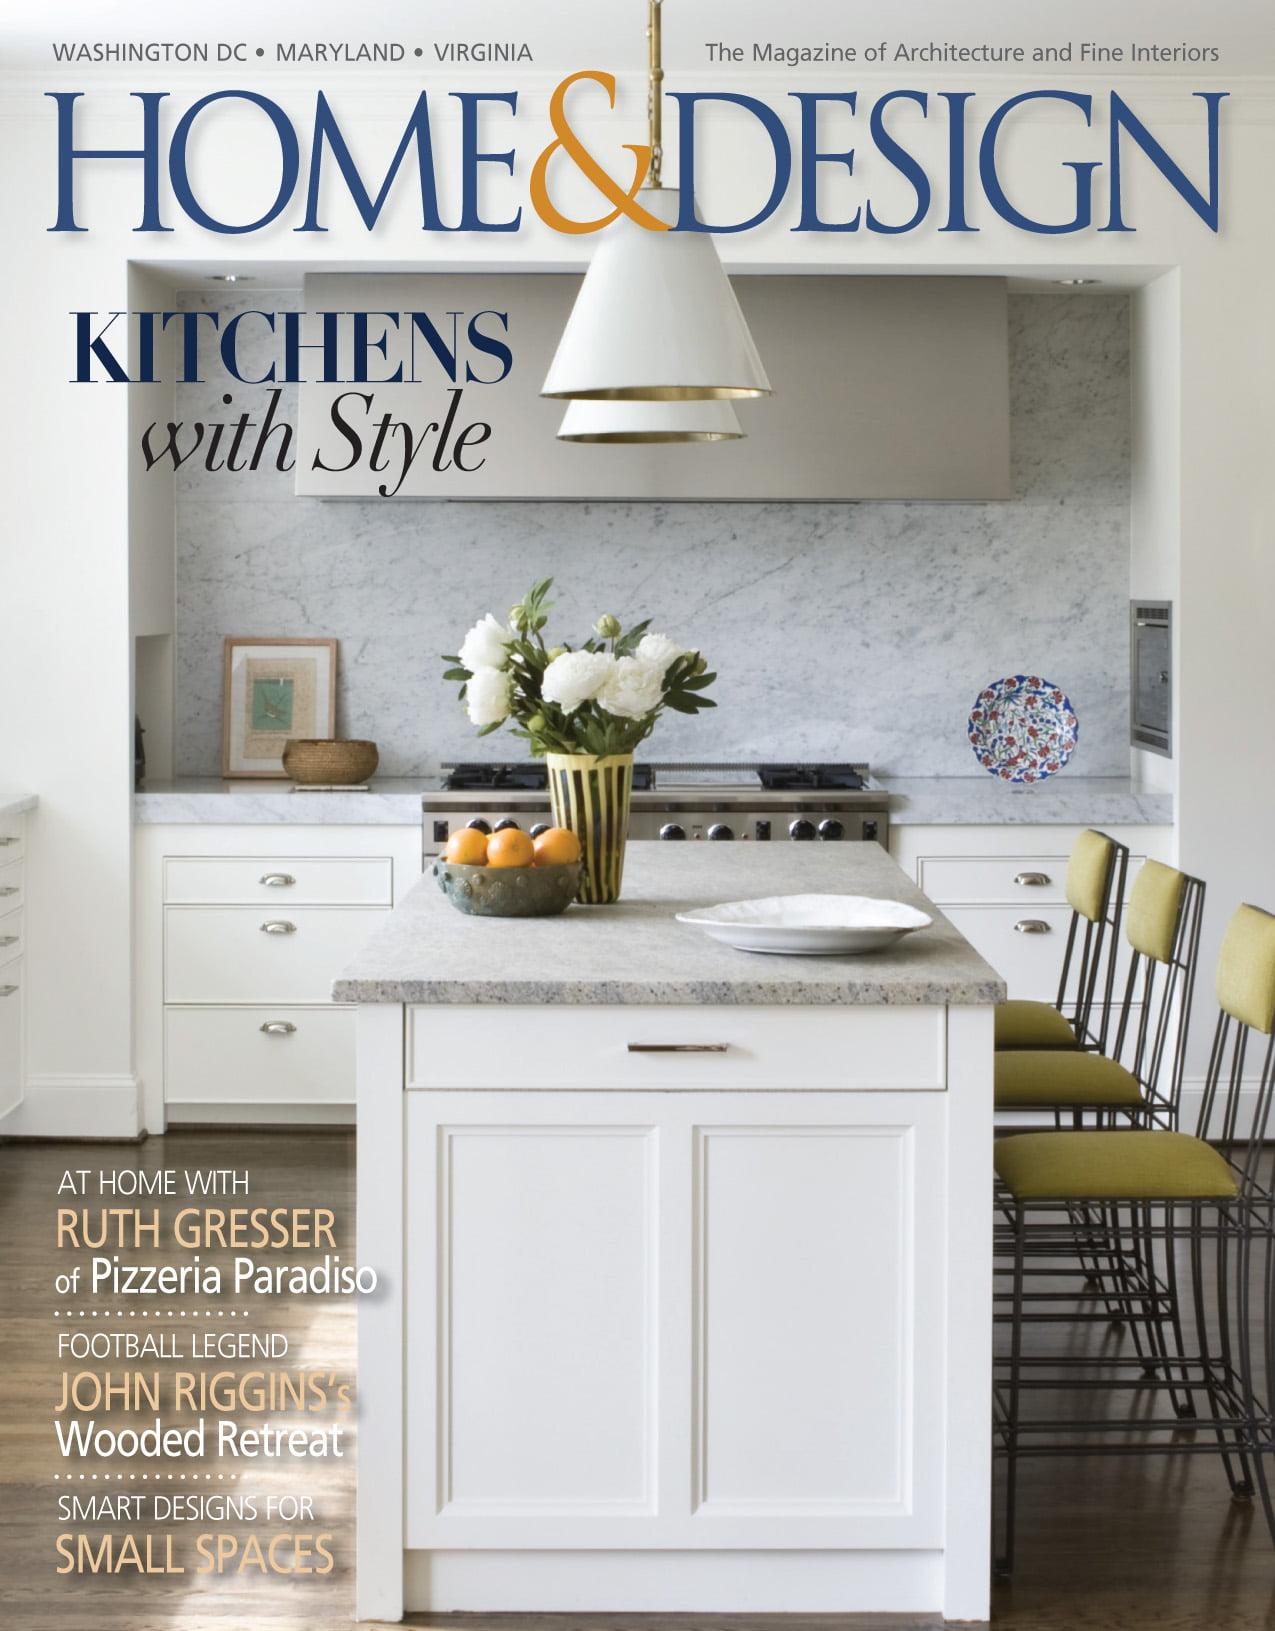 January/February 2014 Archives - Home & Design Magazine